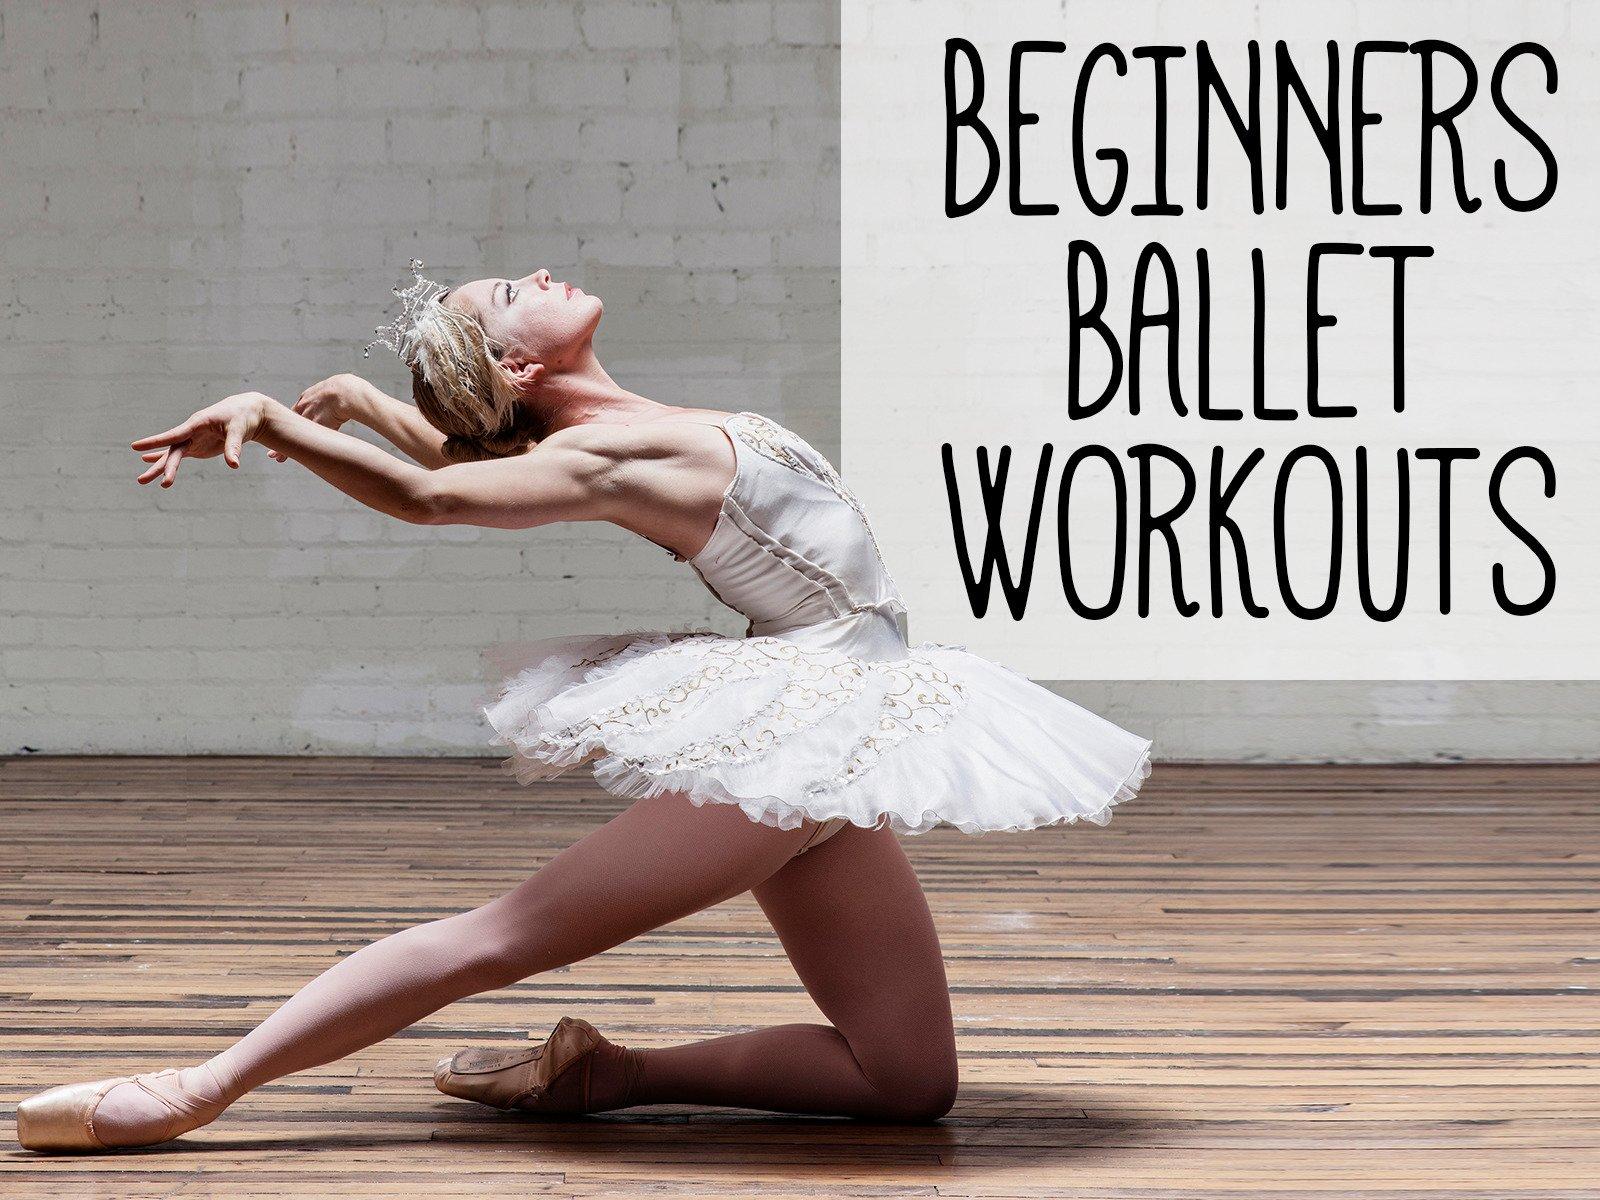 Beginners Ballet Workouts - Season 1